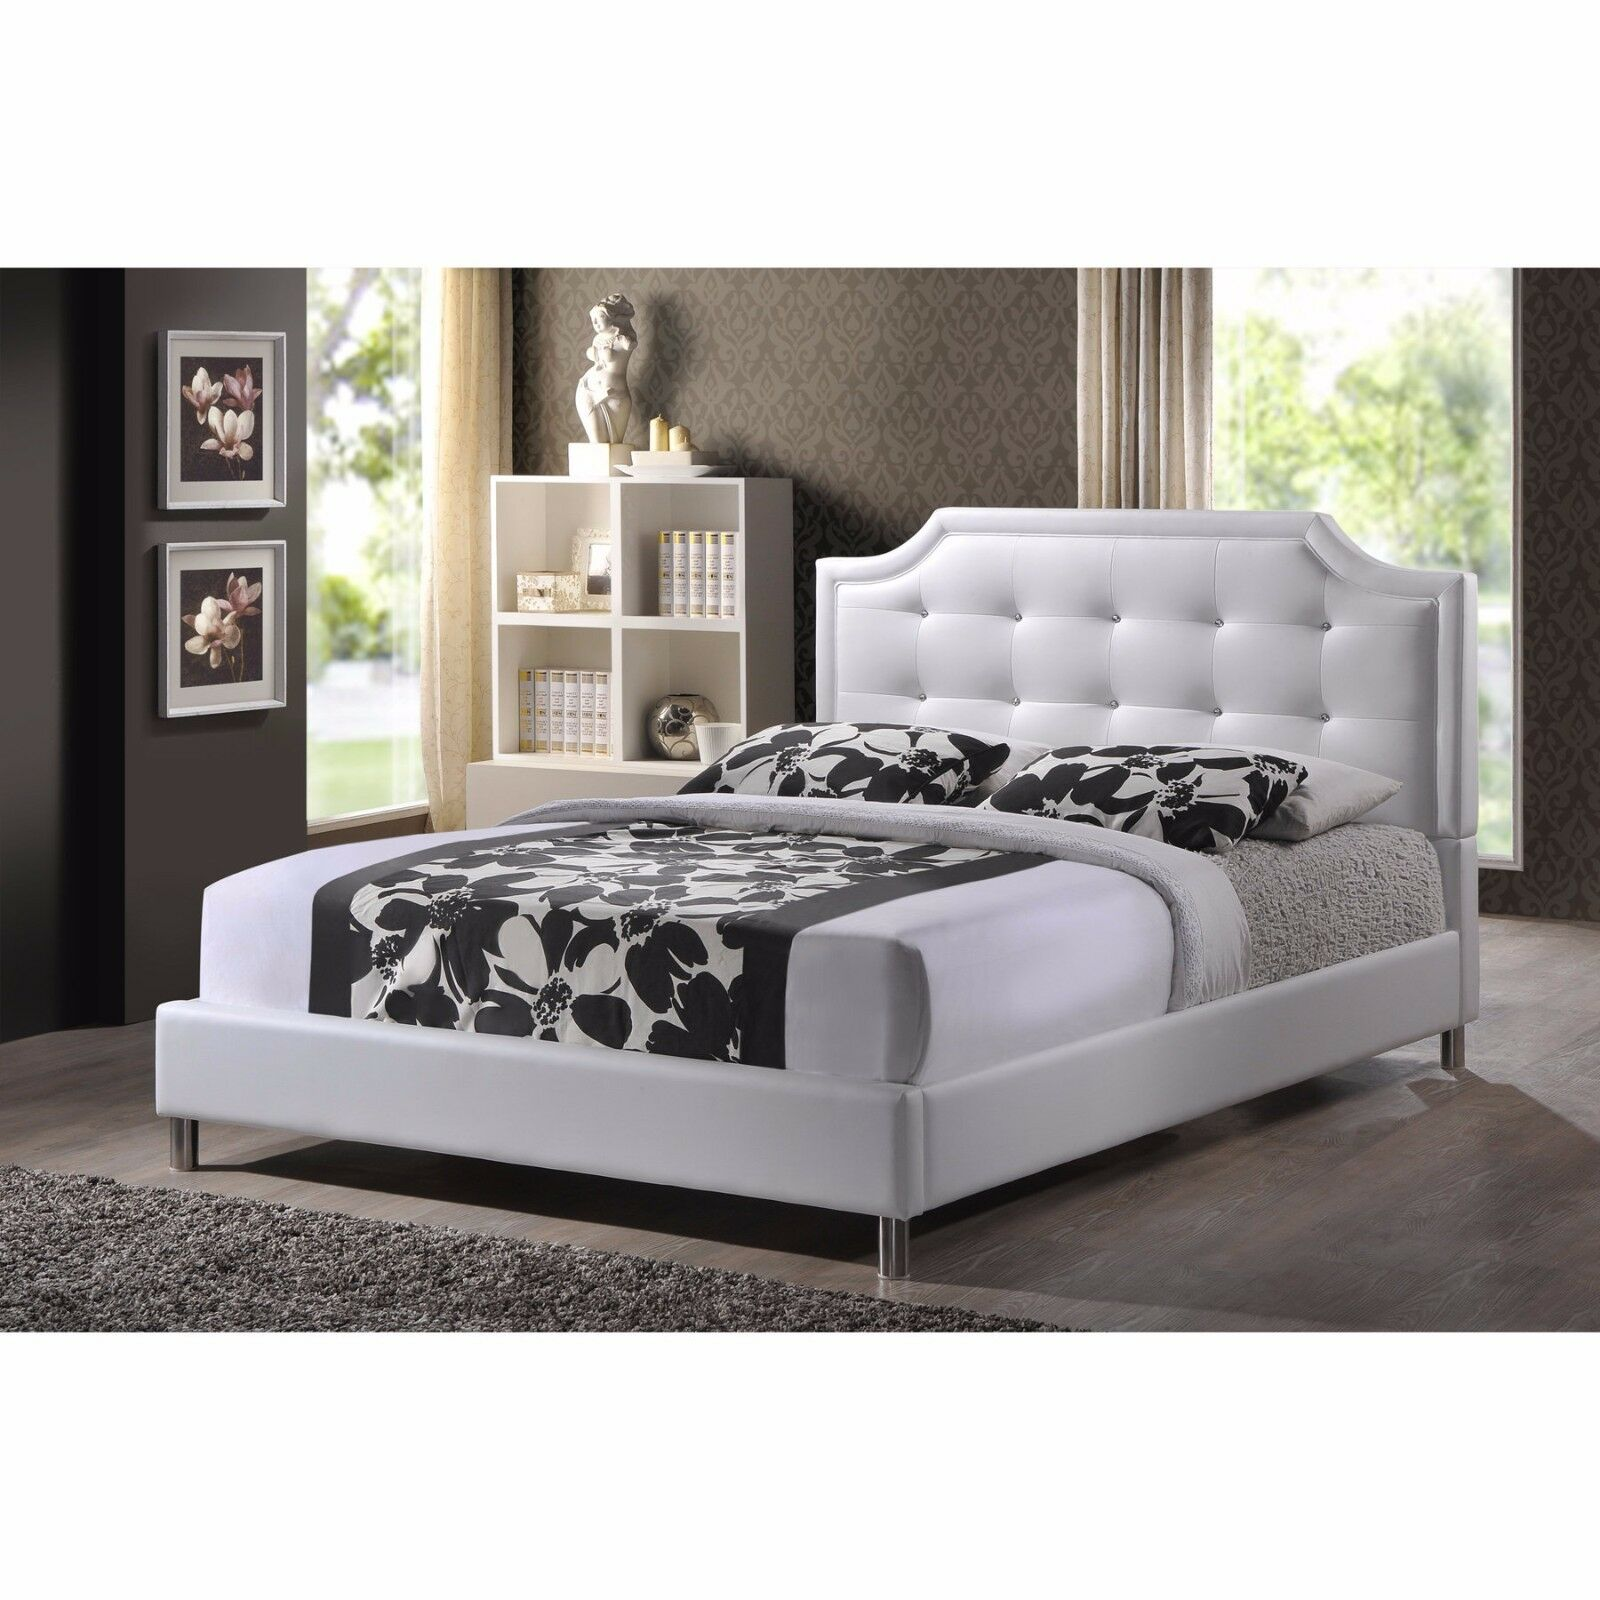 King Size Bed Frame Faux Leather Platform Upholstered Headbo